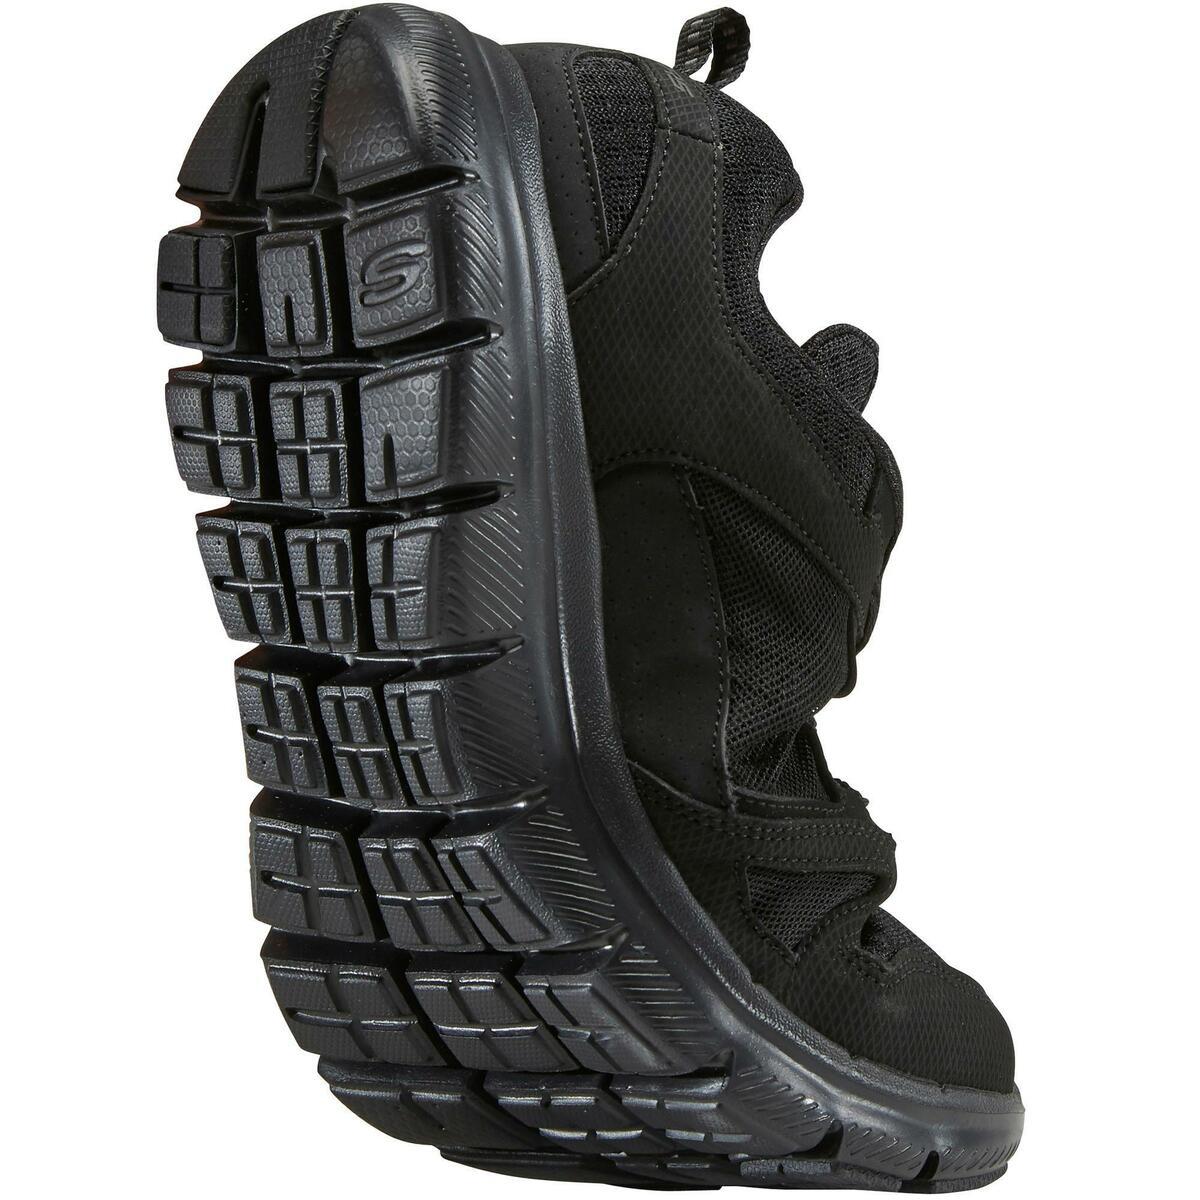 Bild 2 von Walkingschuhe Flex Dual Lite Damen schwarz